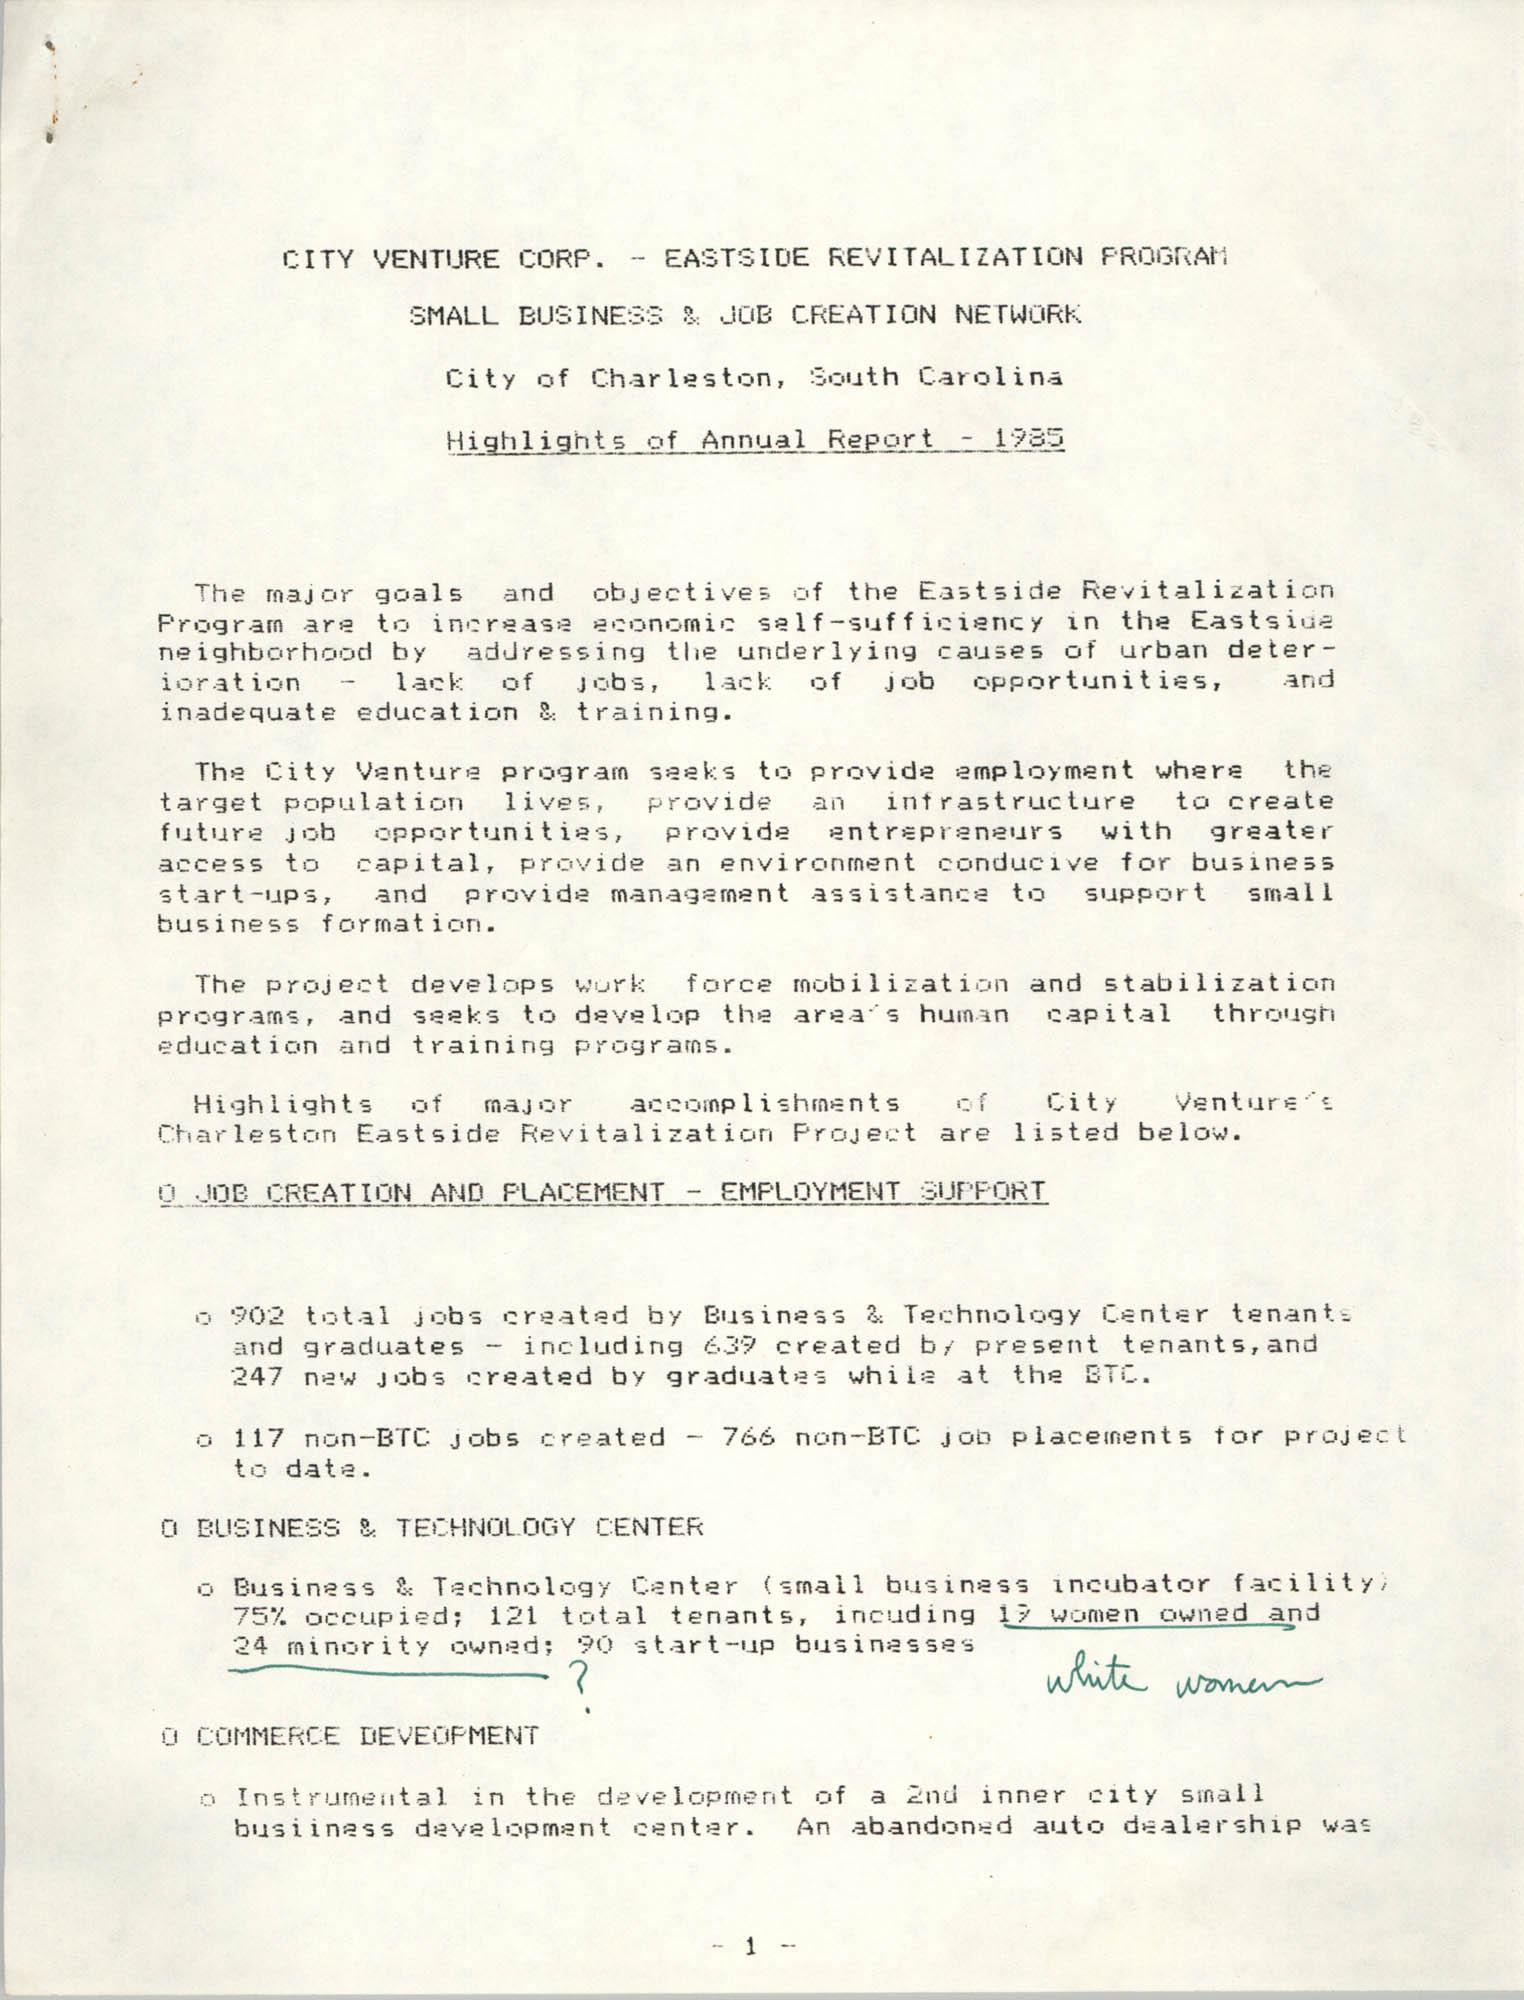 City Venue Corp. – Eastside Revitalization Program, Small Business and Job Creation Network, 1985